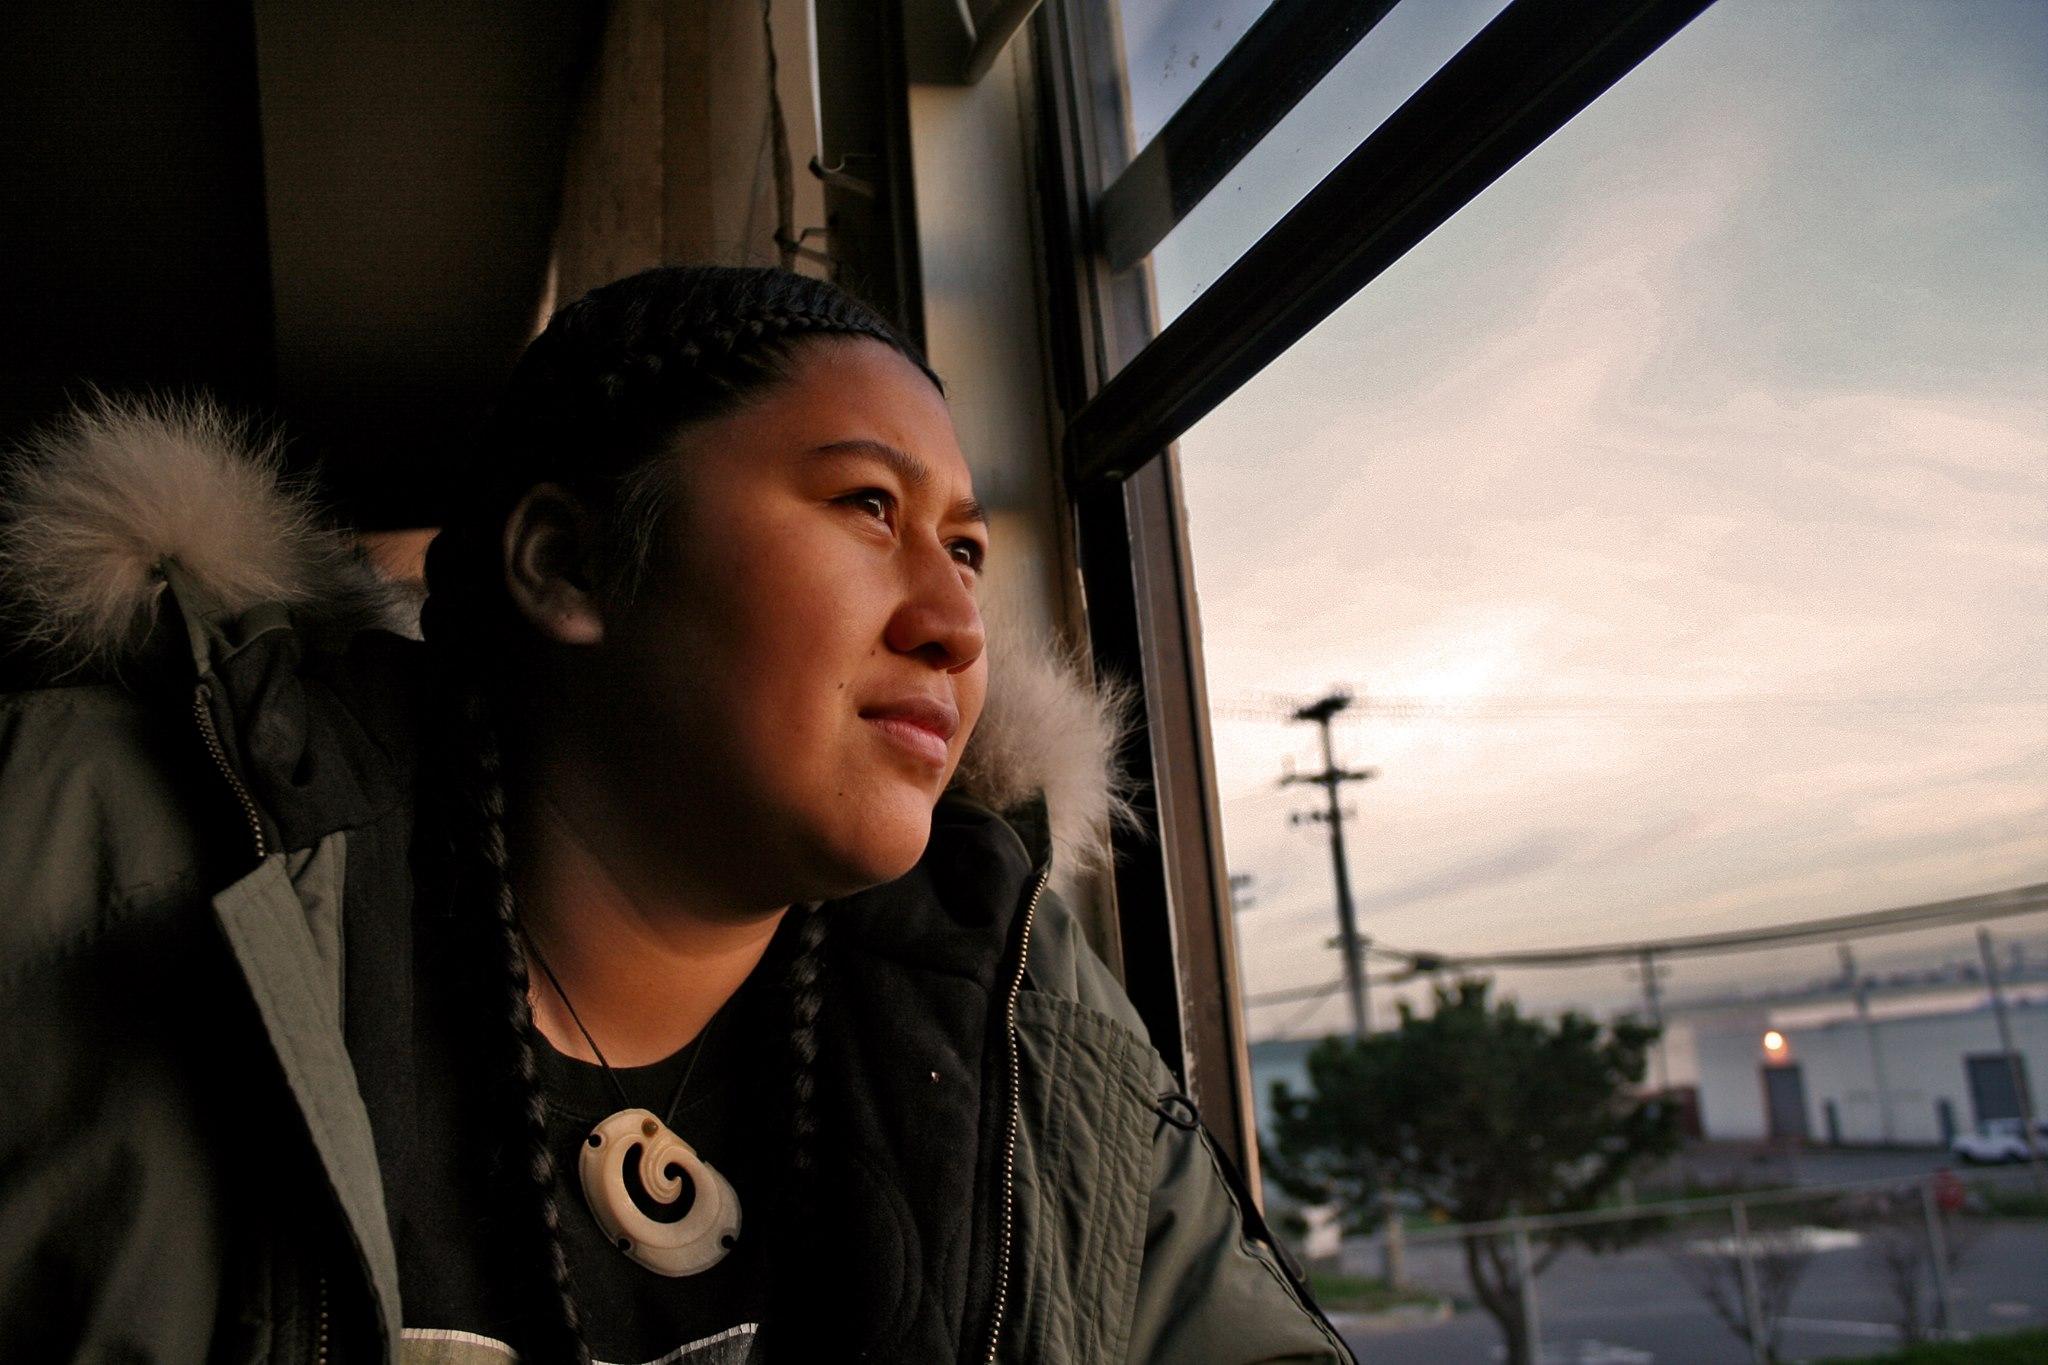 Melesaine in her family home on Oakdale Ave. in Bayview San Francisco, Ca. (Photo: Jason Meki)